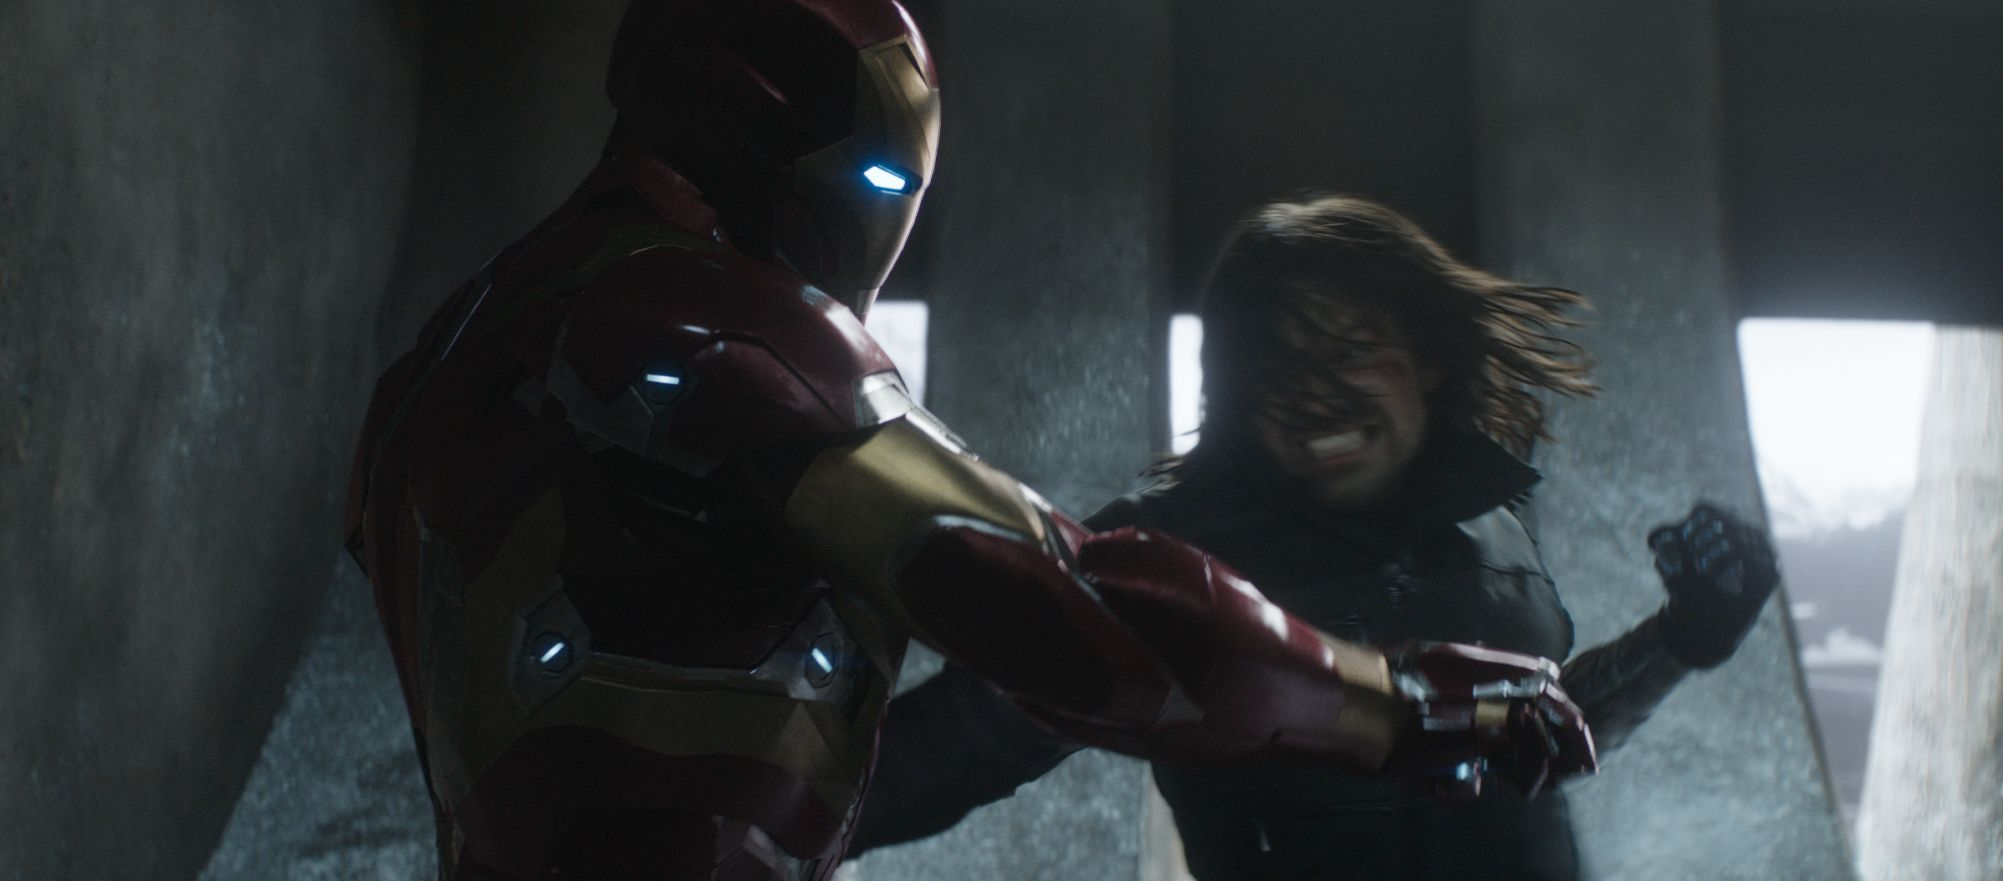 LLOYD'S BEWARE THE BLOG: Marvel Studio's CAPTAIN AMERICA